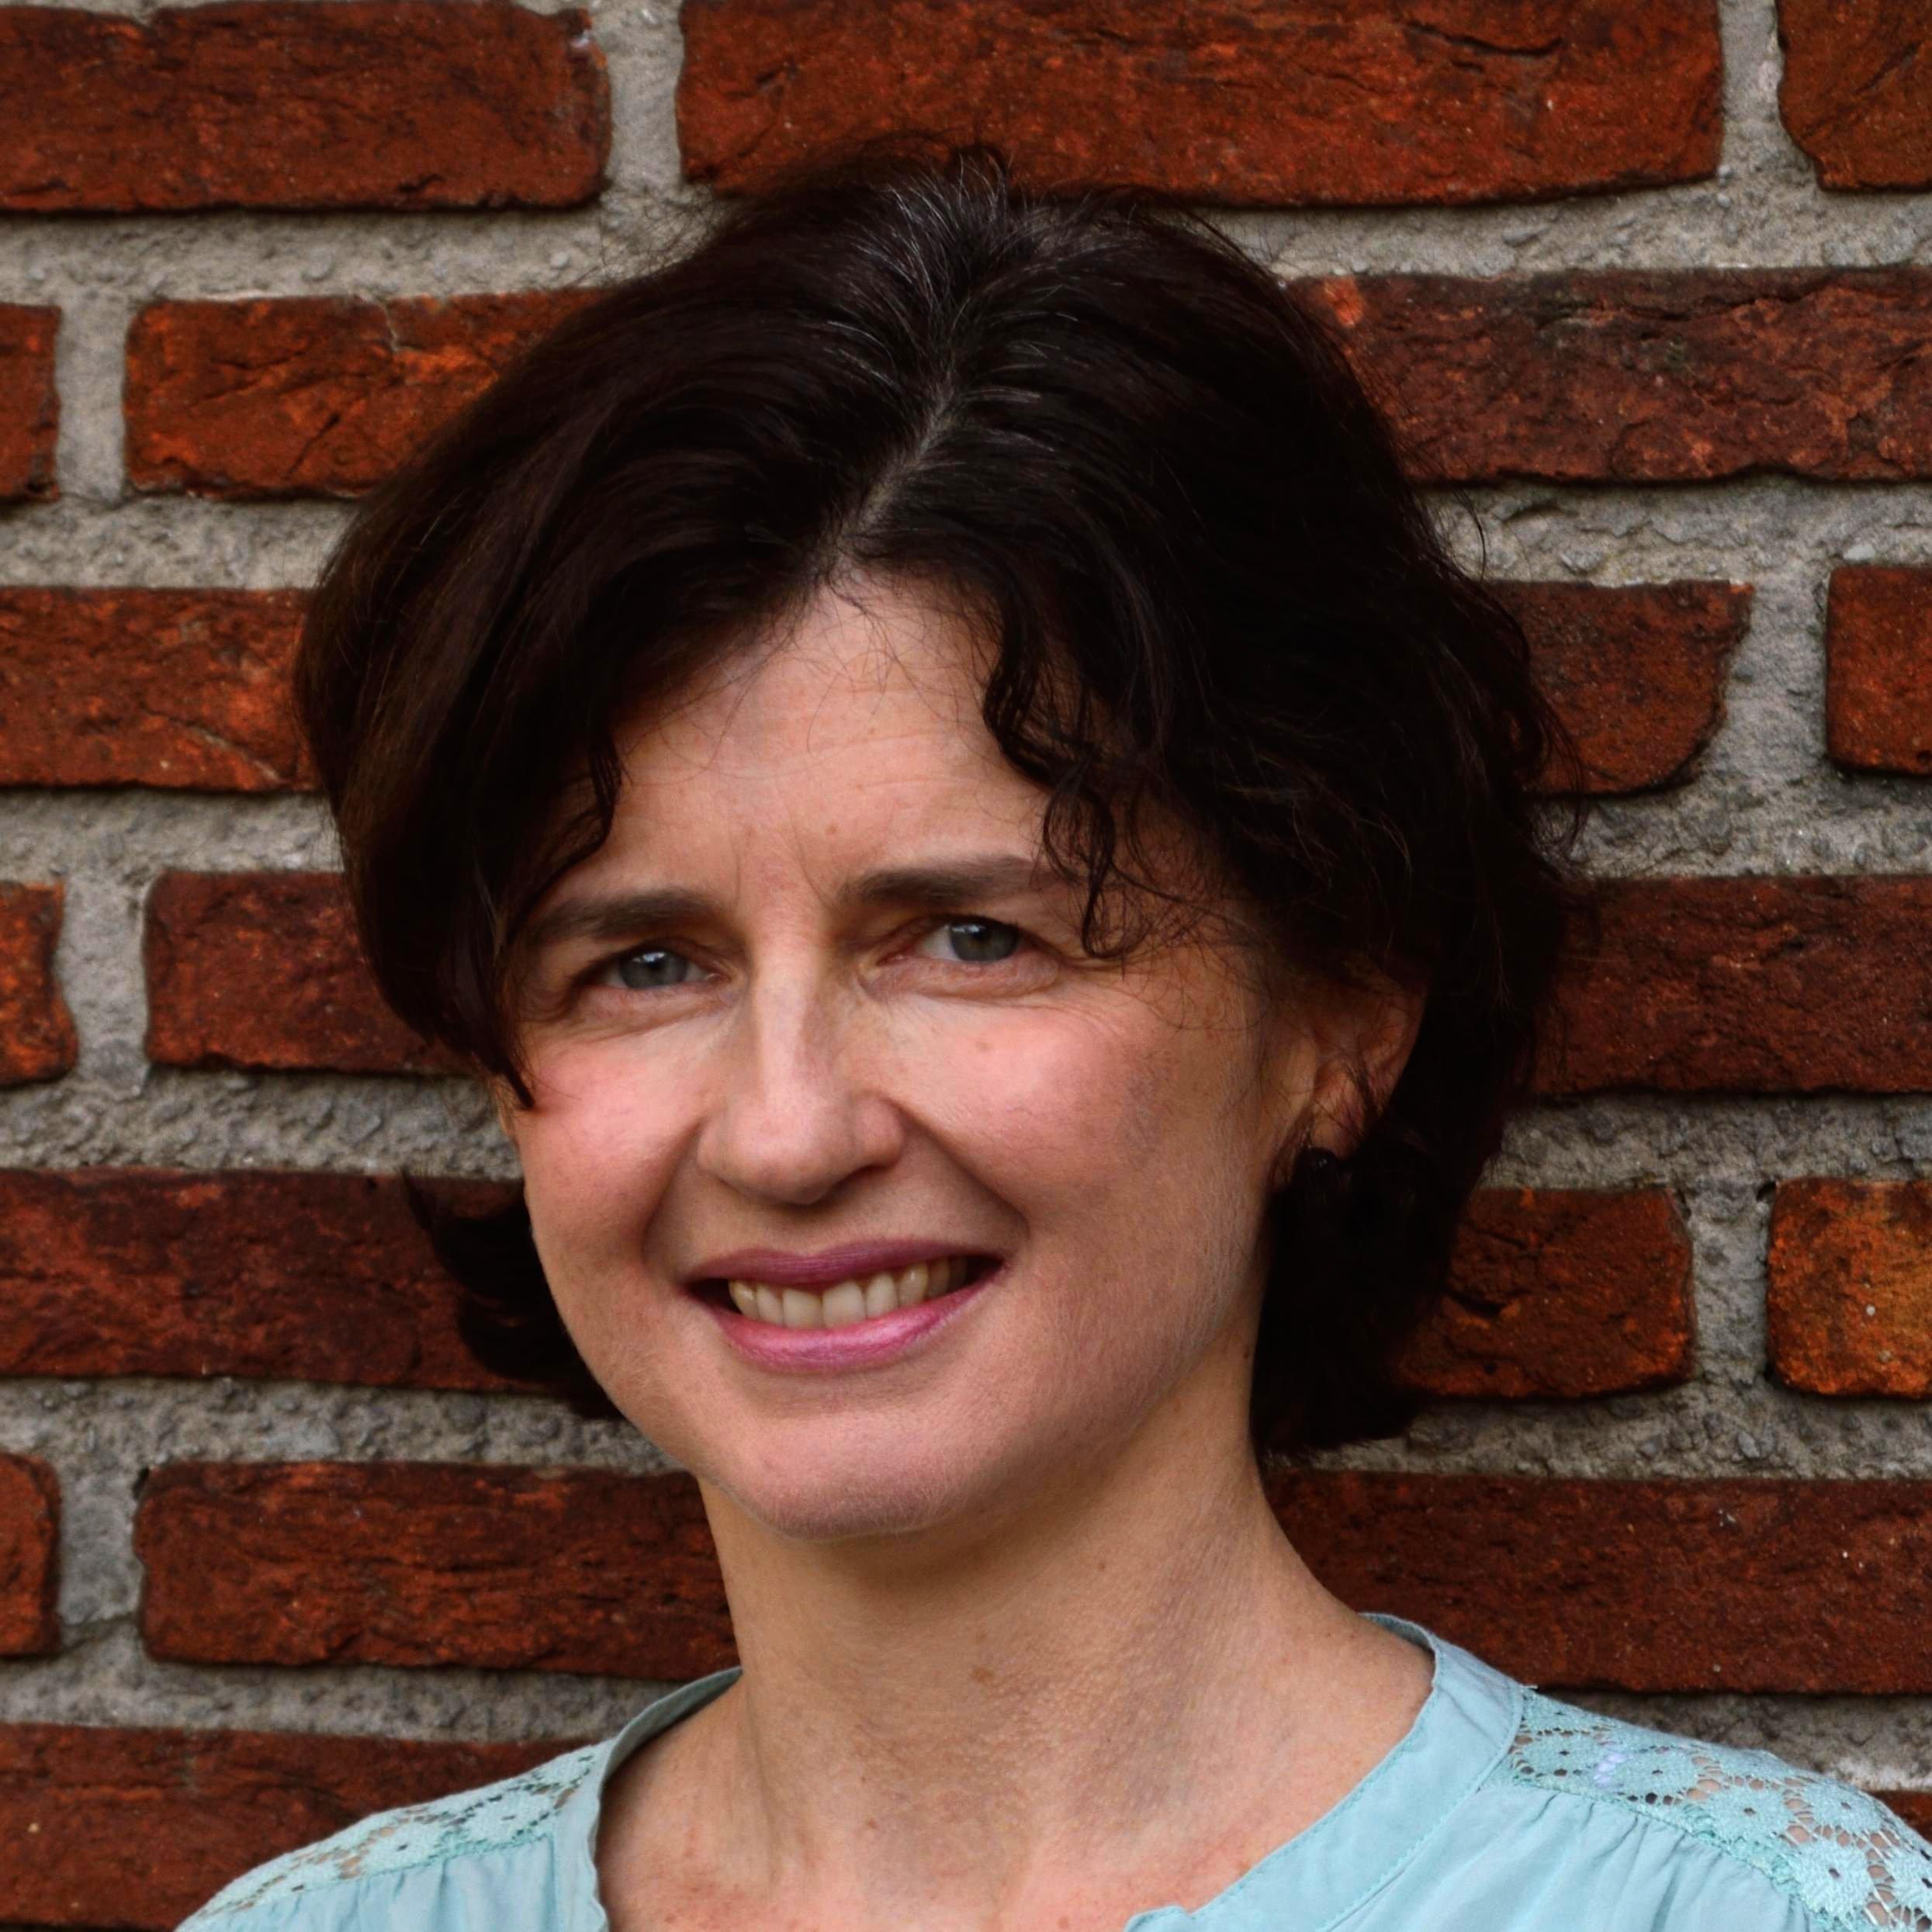 Margaret Kernan, Team Leader Early Years, International Child Development Initiatives, NL